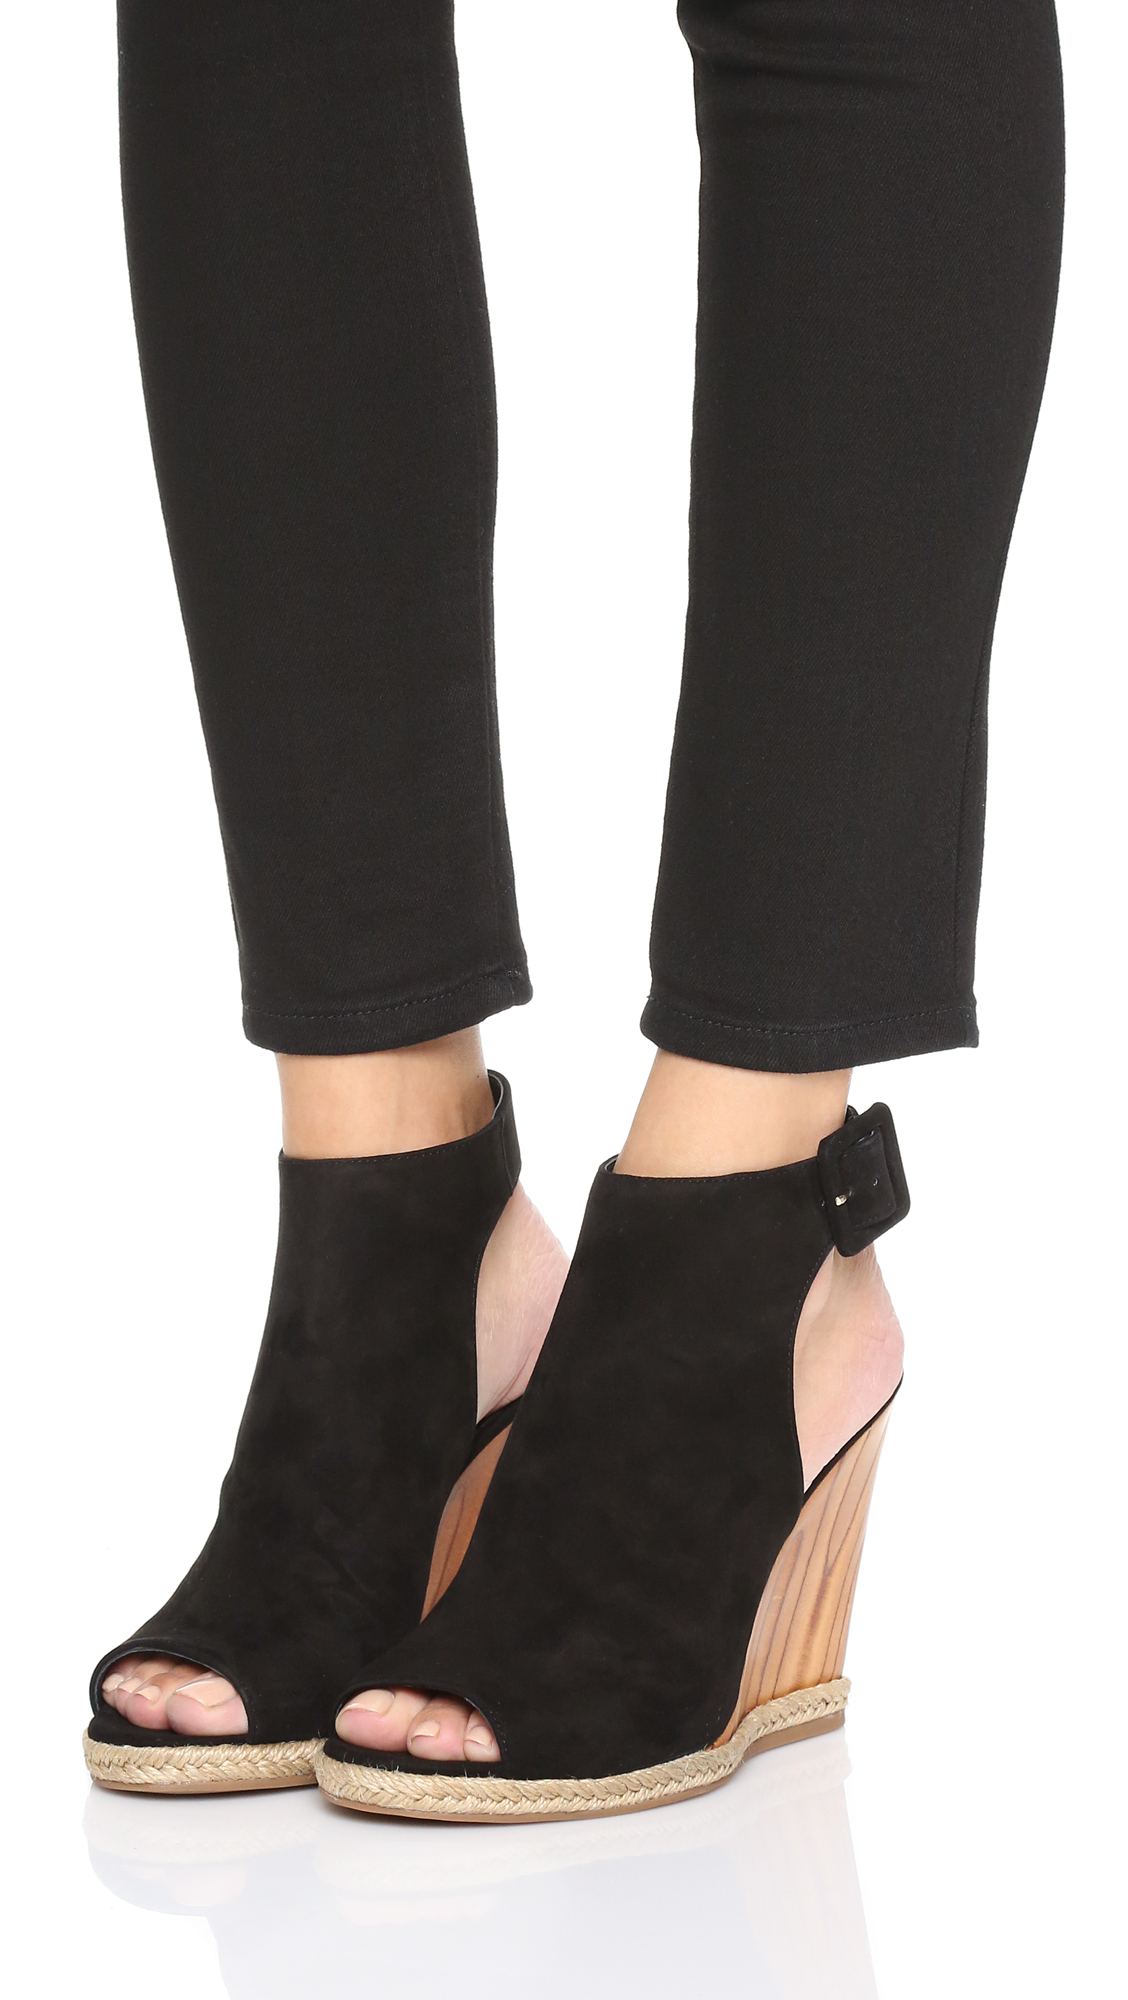 df793f8a5cc60 Tory Burch Raya Wedge Sandals